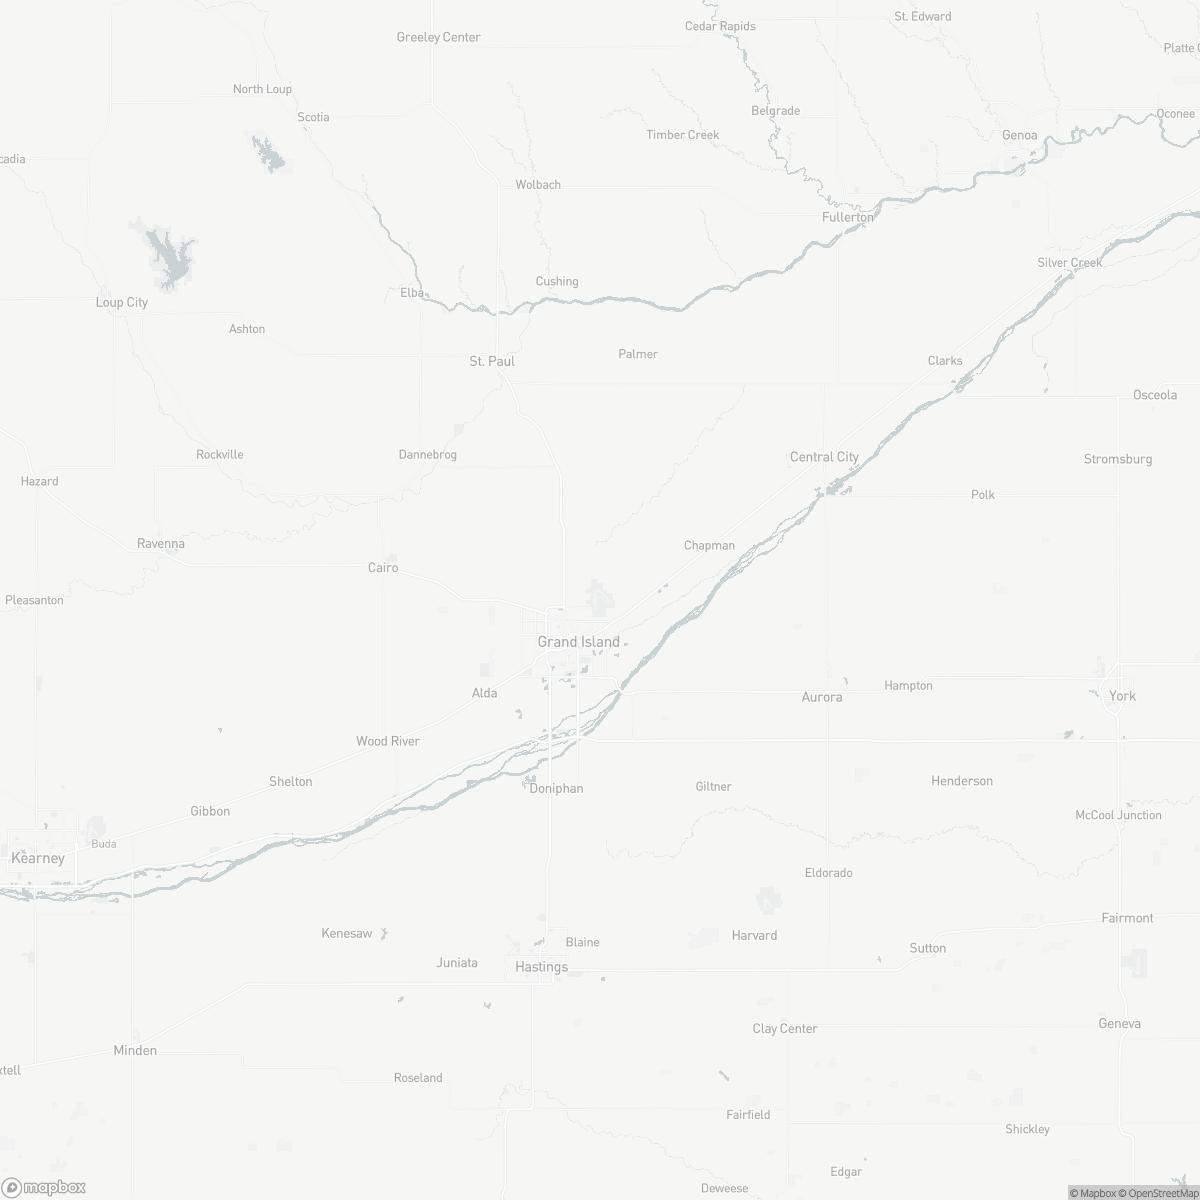 Map of Central Nebraska Regional Airport GRI surrounding area of Grand Island Nebraska